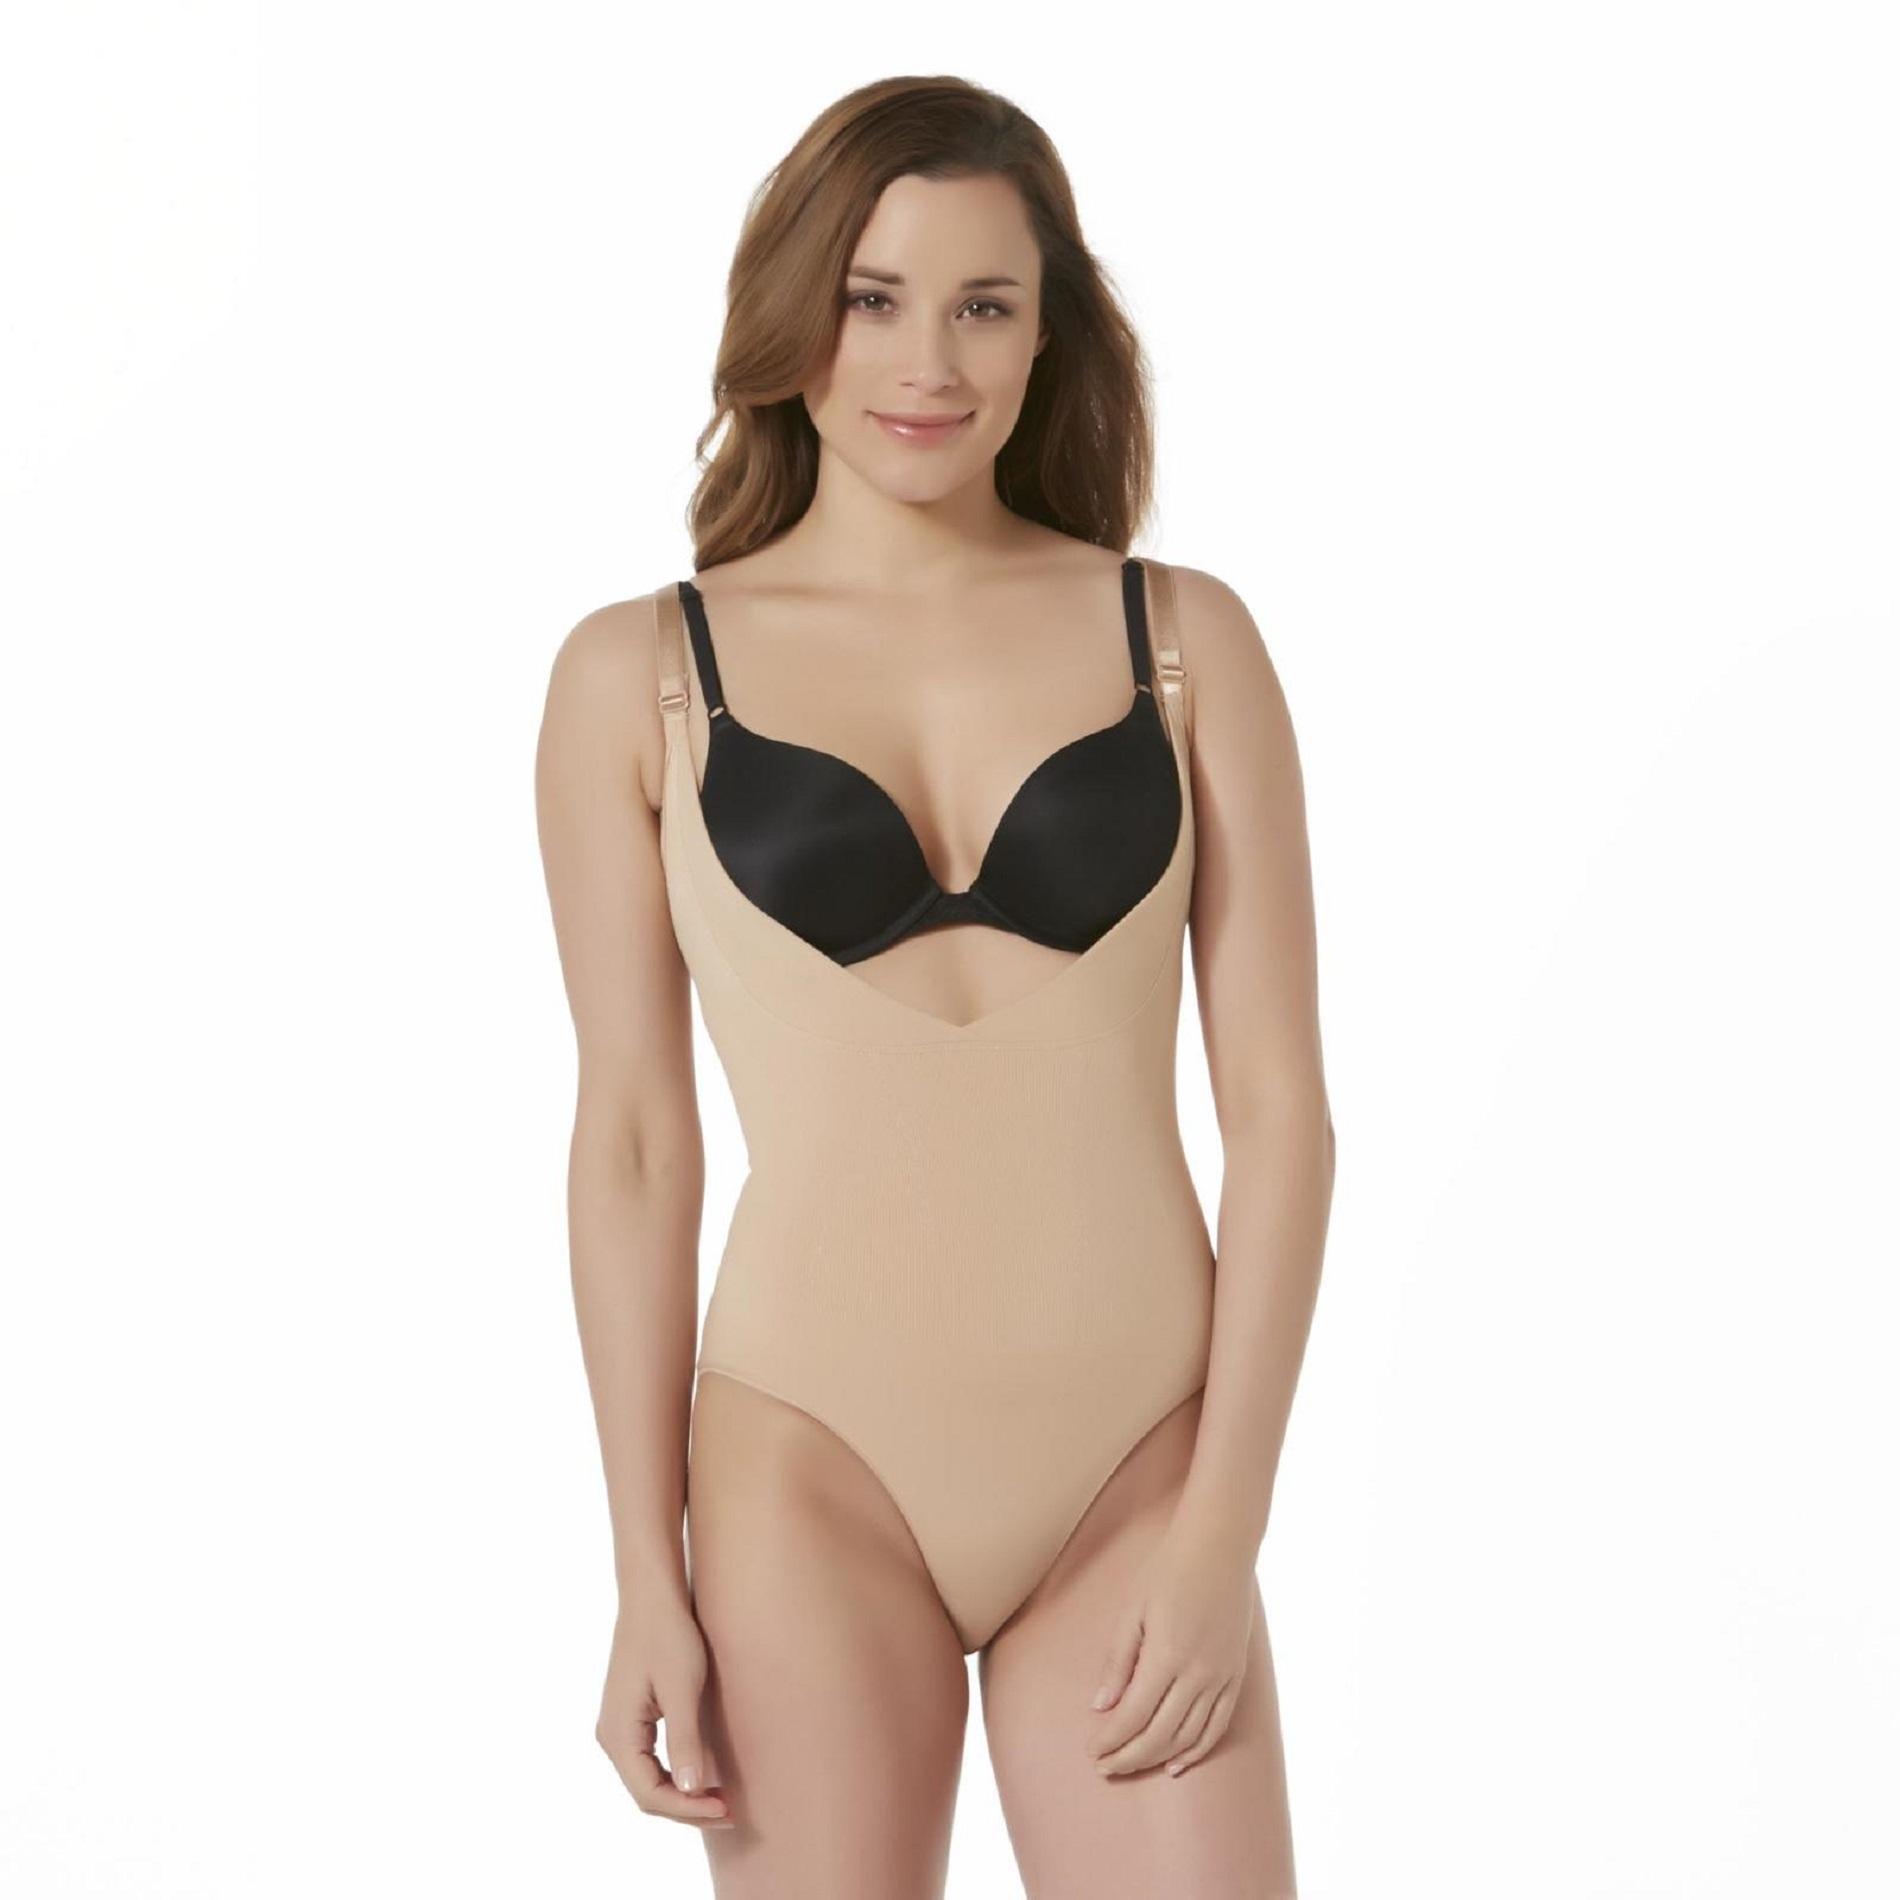 waterbury garment Women's Bodysuit Shaper